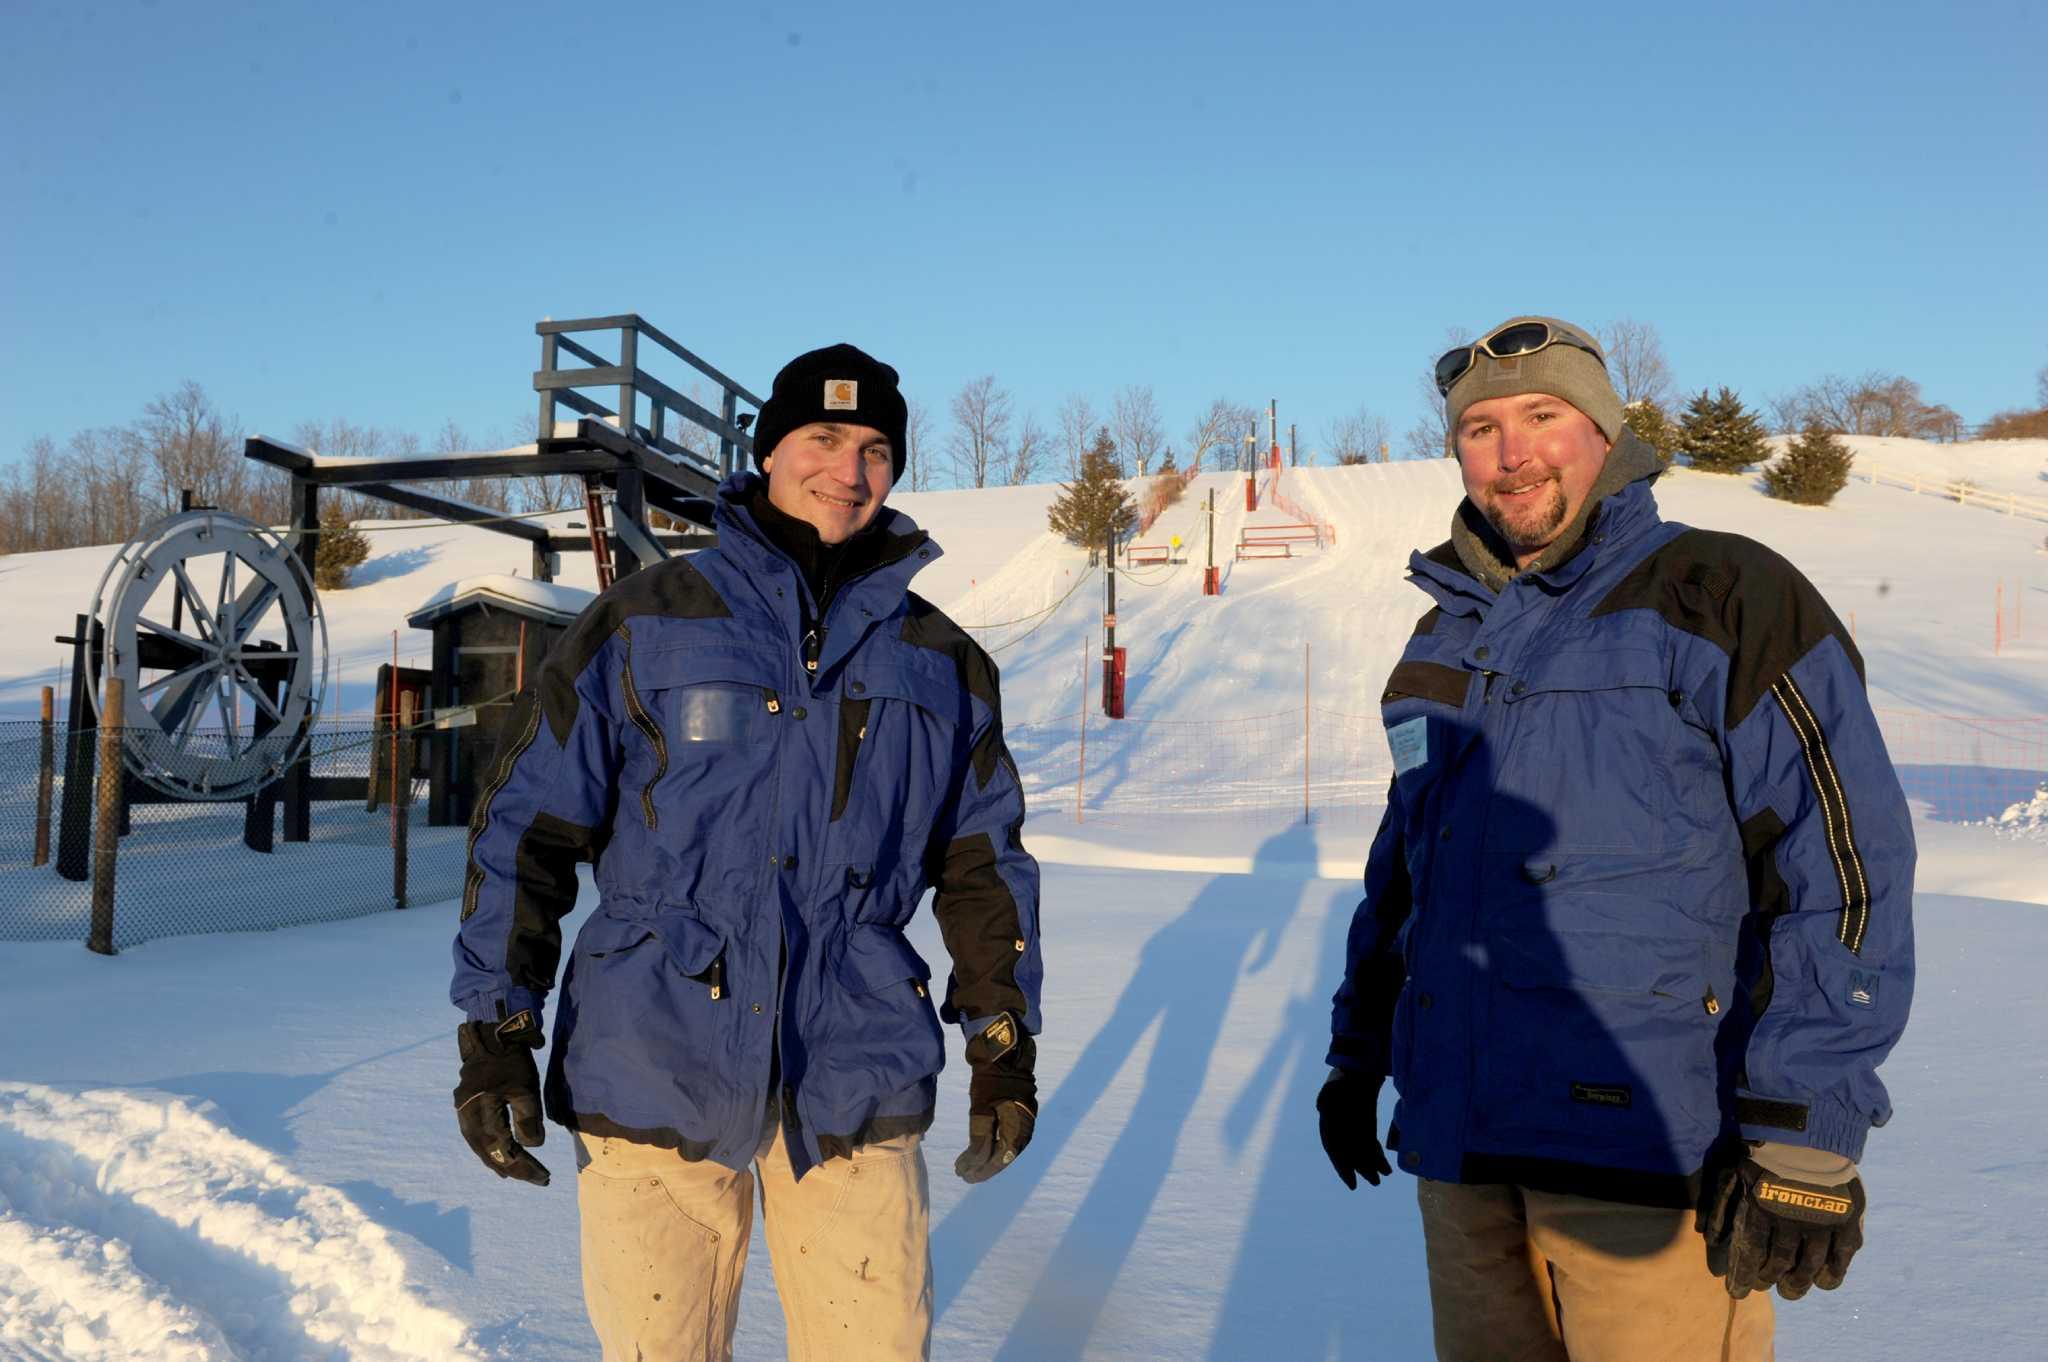 the diy ski slope of columbia county u0027s tom and mark herishko